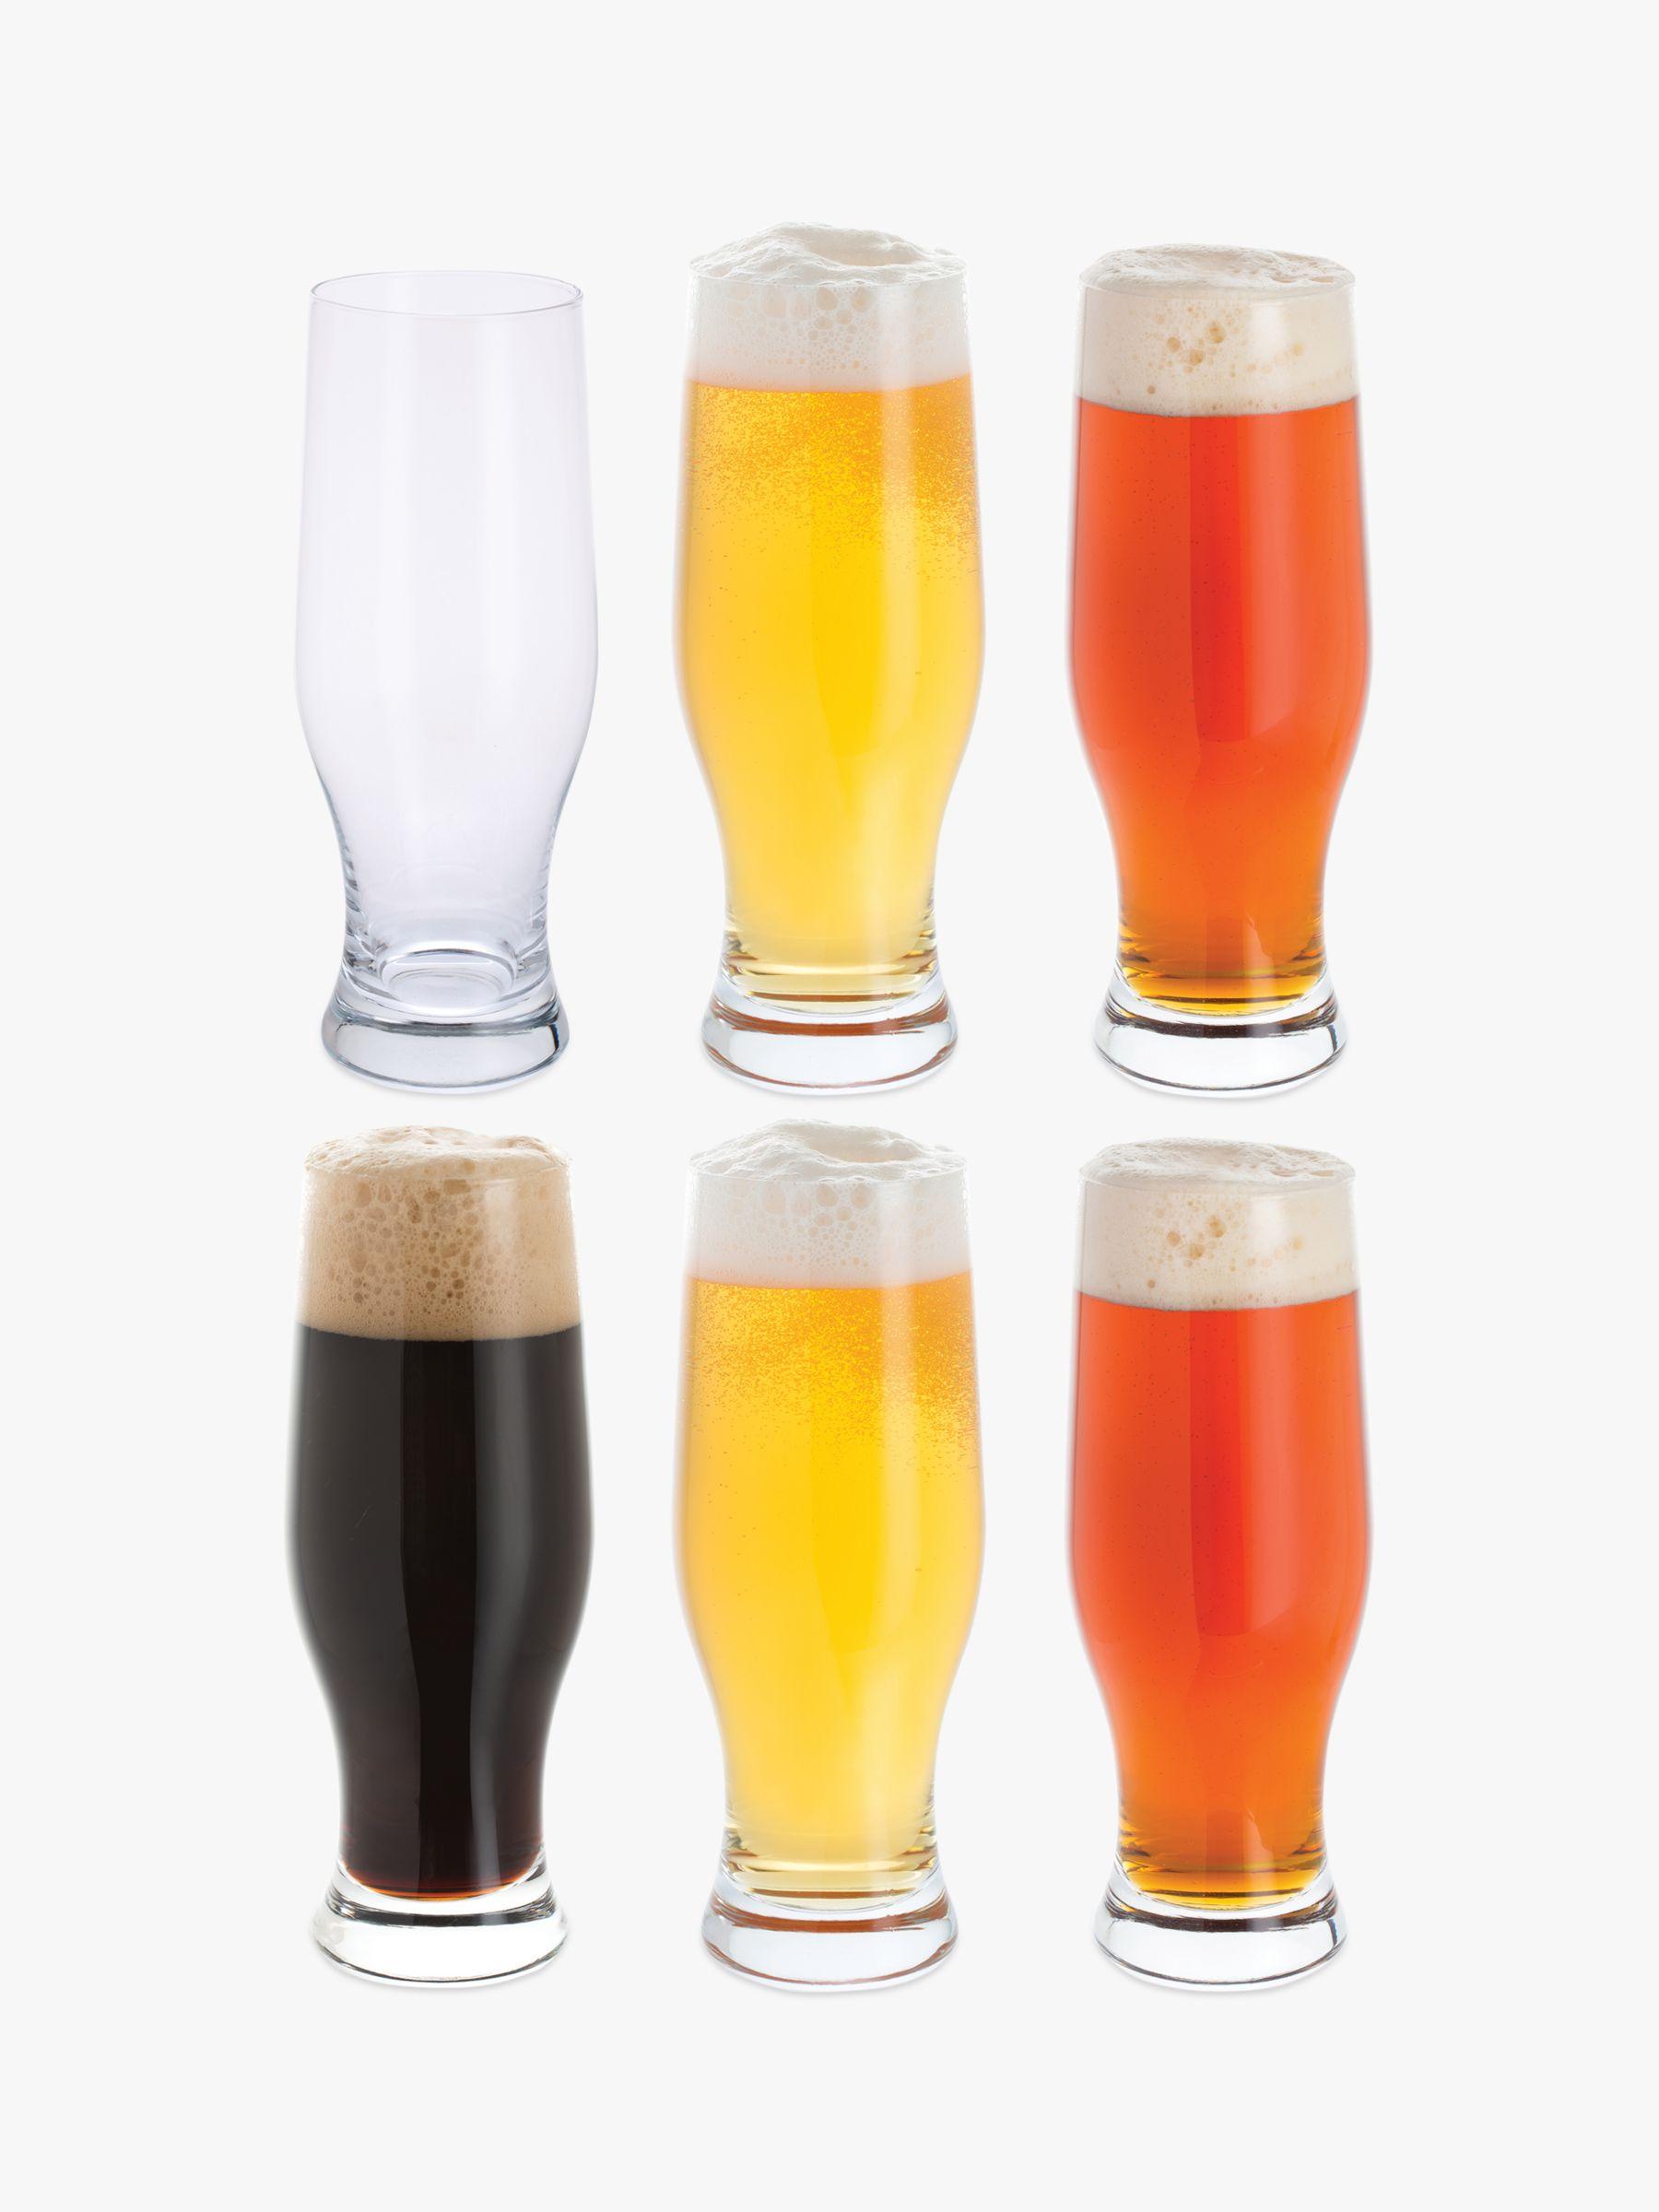 Dartington Crystal Dartington Crystal Beer Party Pack Glasses, Set of 6, 500ml, Clear